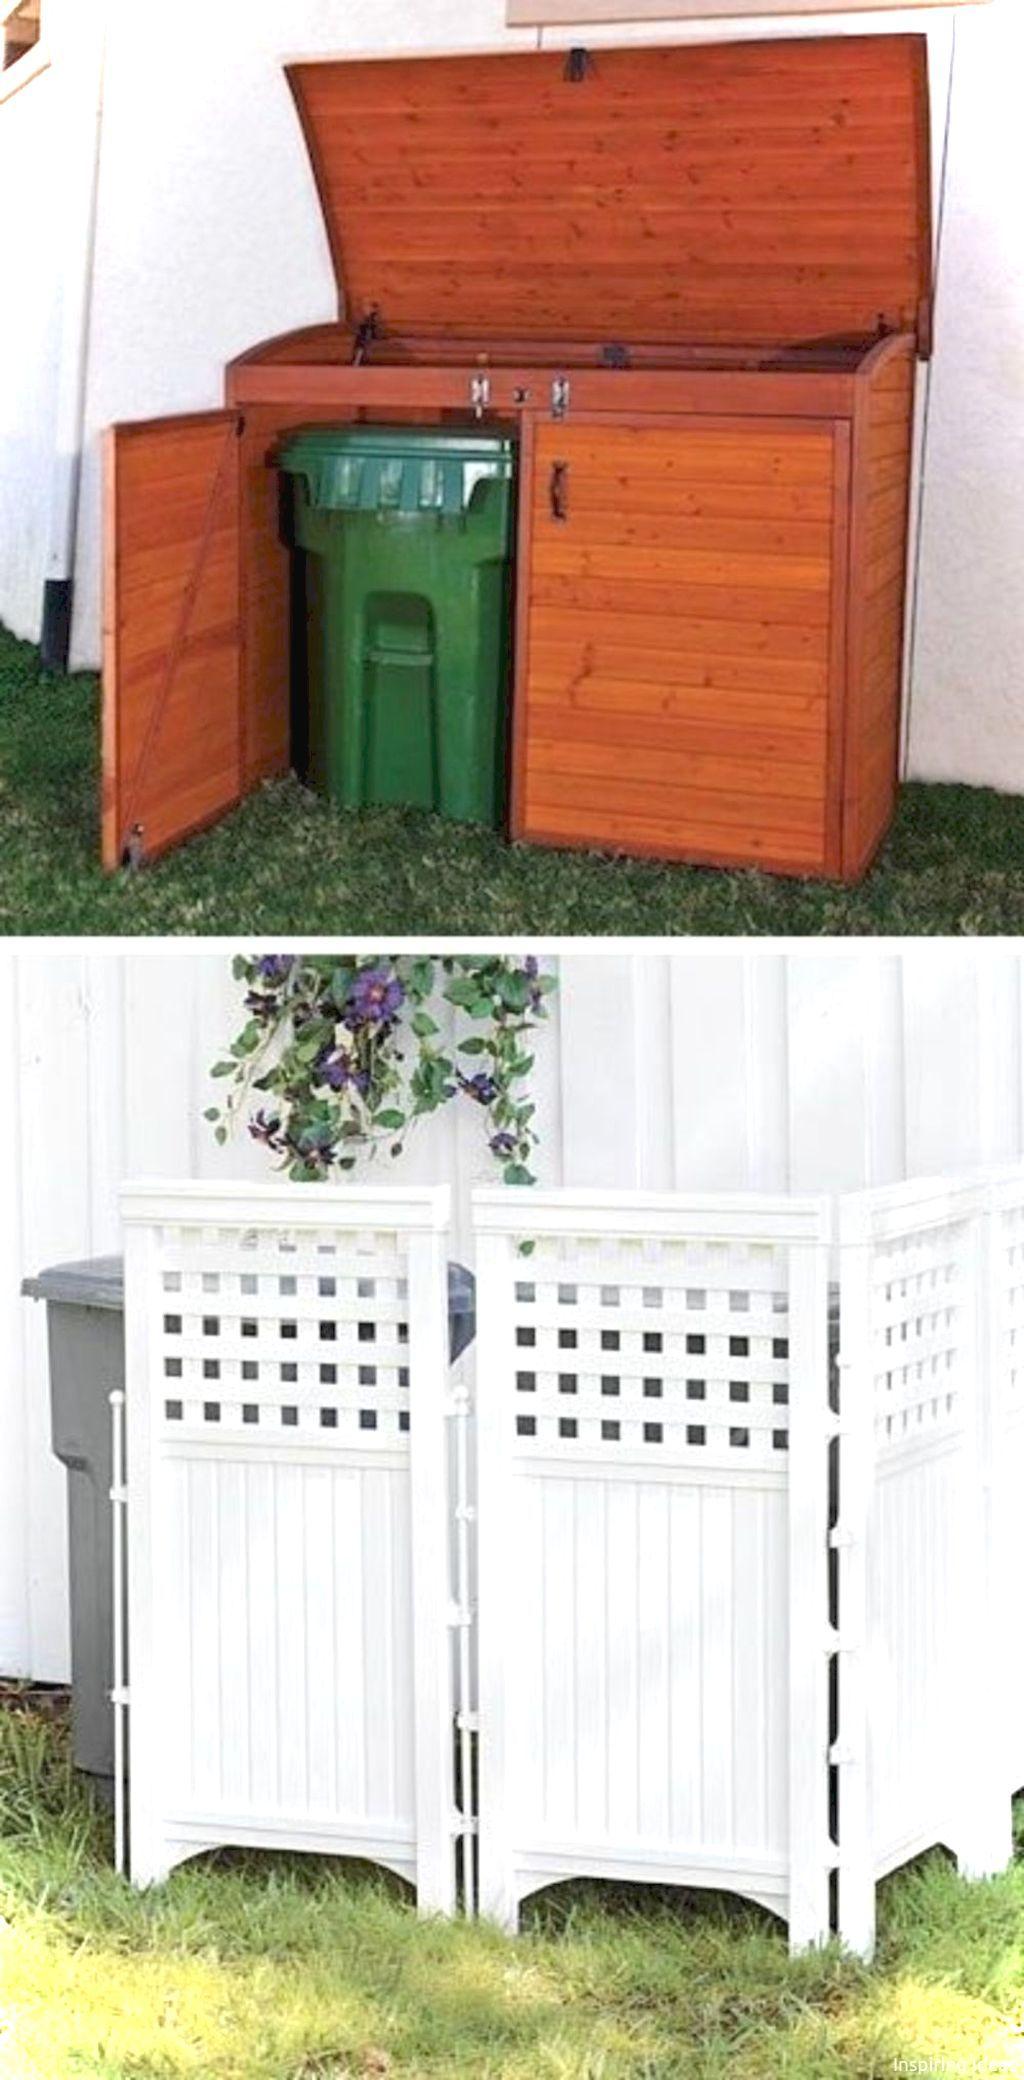 wood patio ideas on a budget. Cool 69 Awesome Backyard Patio Ideas On A Budget Https://roomaholic.com Wood O